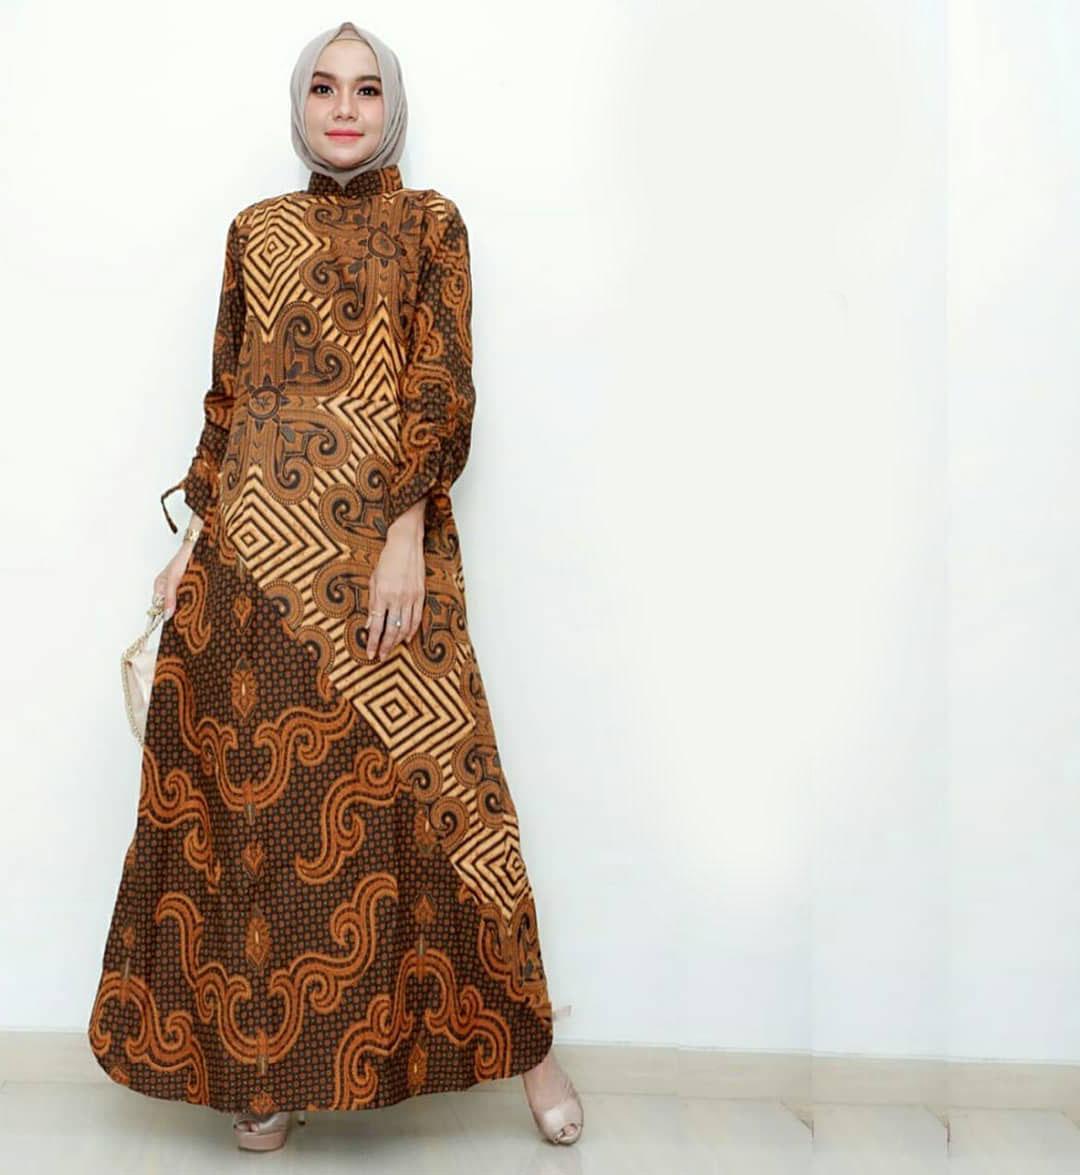 32 Vogue Gamis Batik Pesta Kombinasi Satin Sifon Brokat